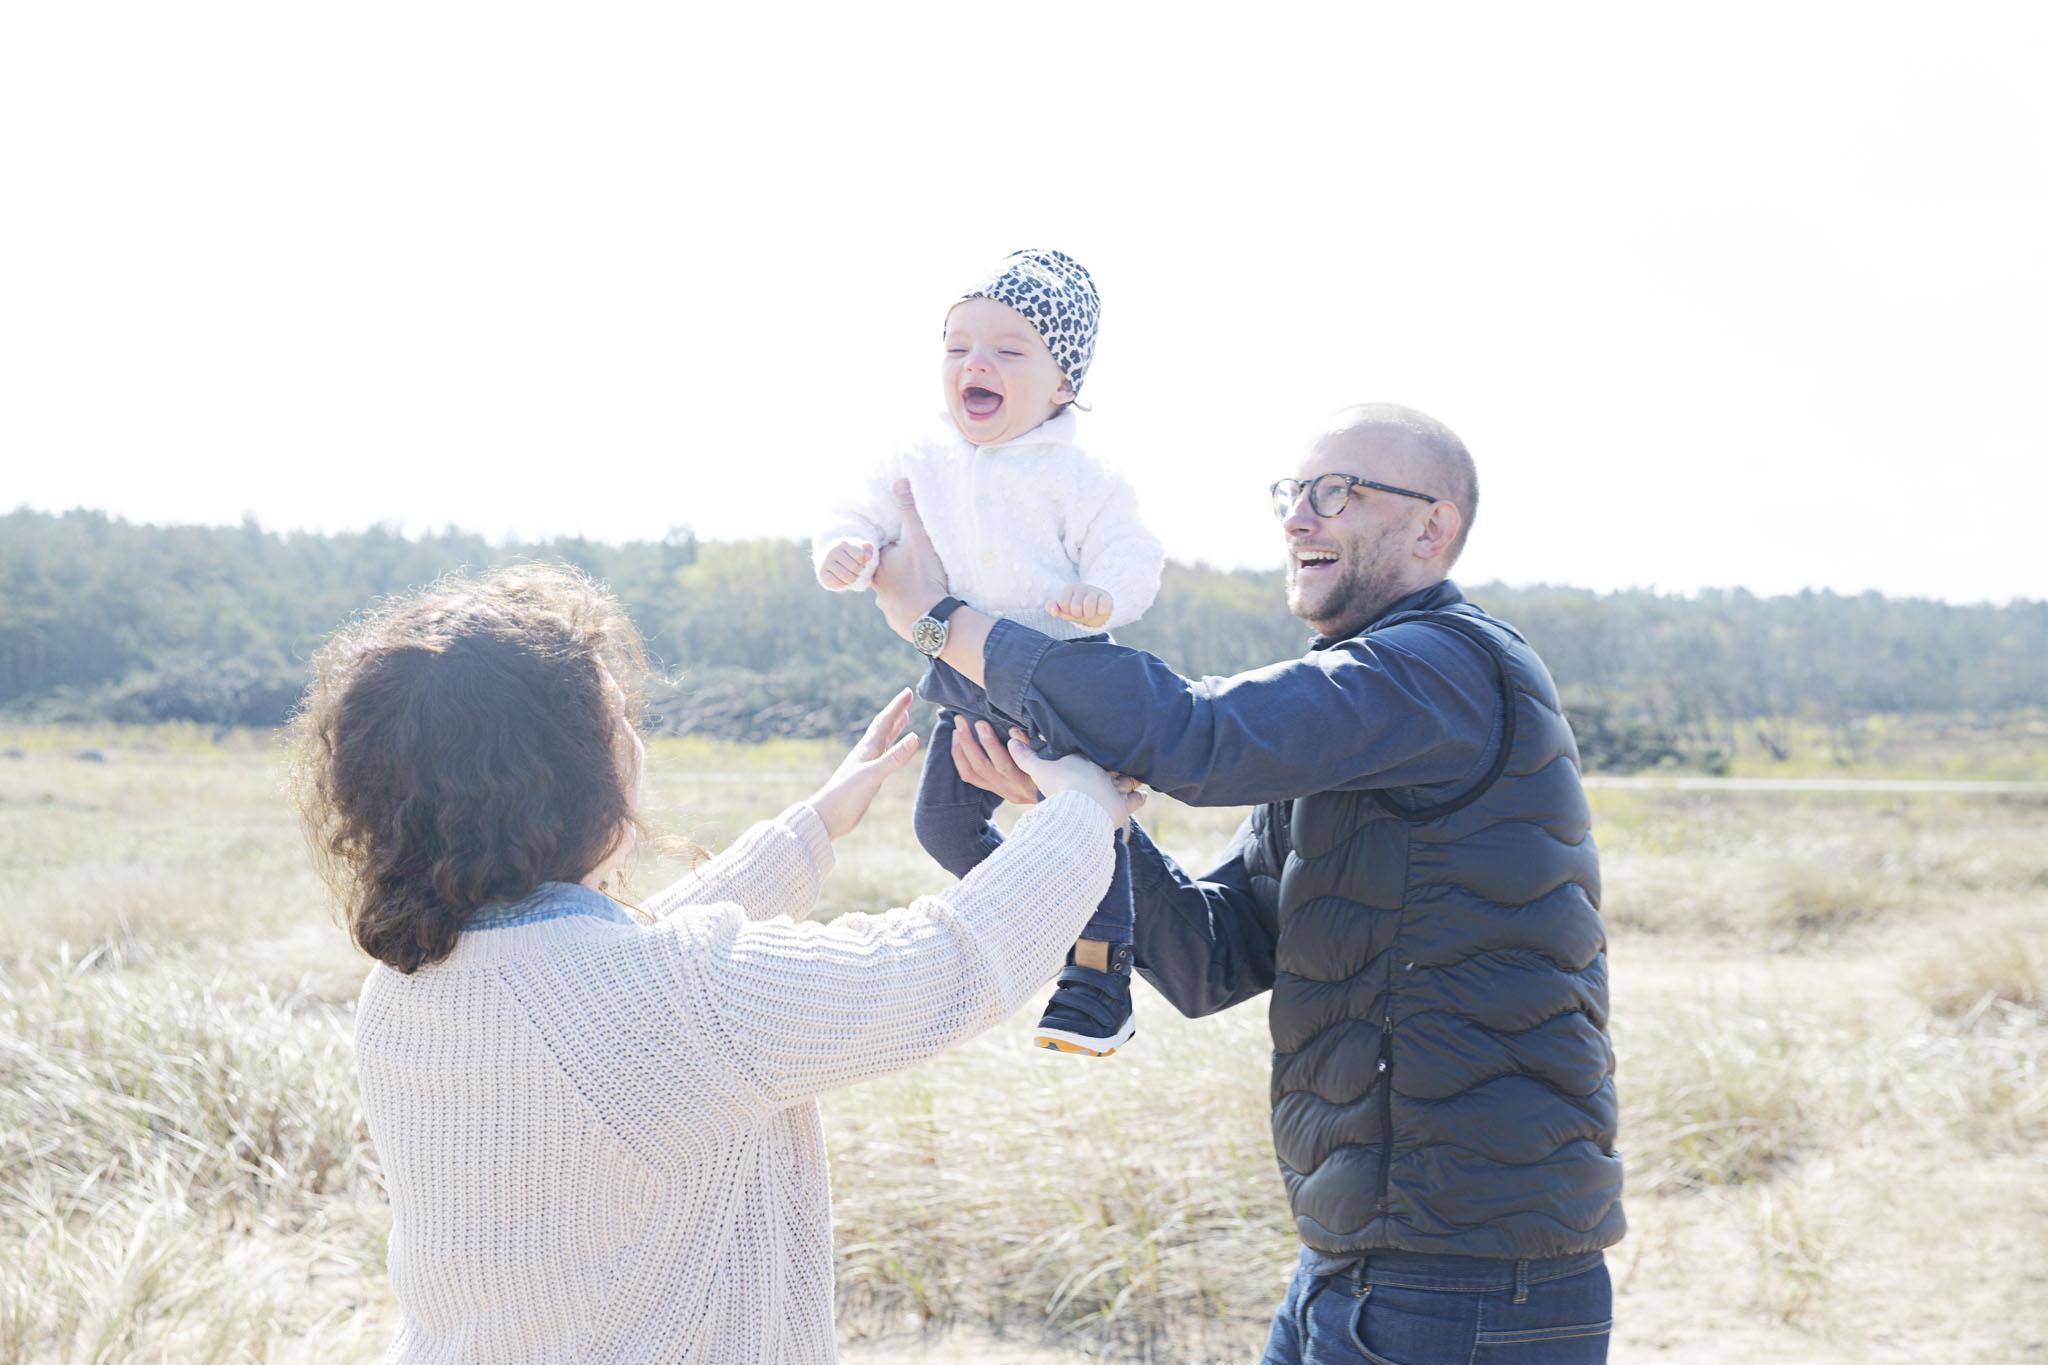 Familjefotografering i laholm, fotograf emy fotograferar din familj och dina barn i laholm